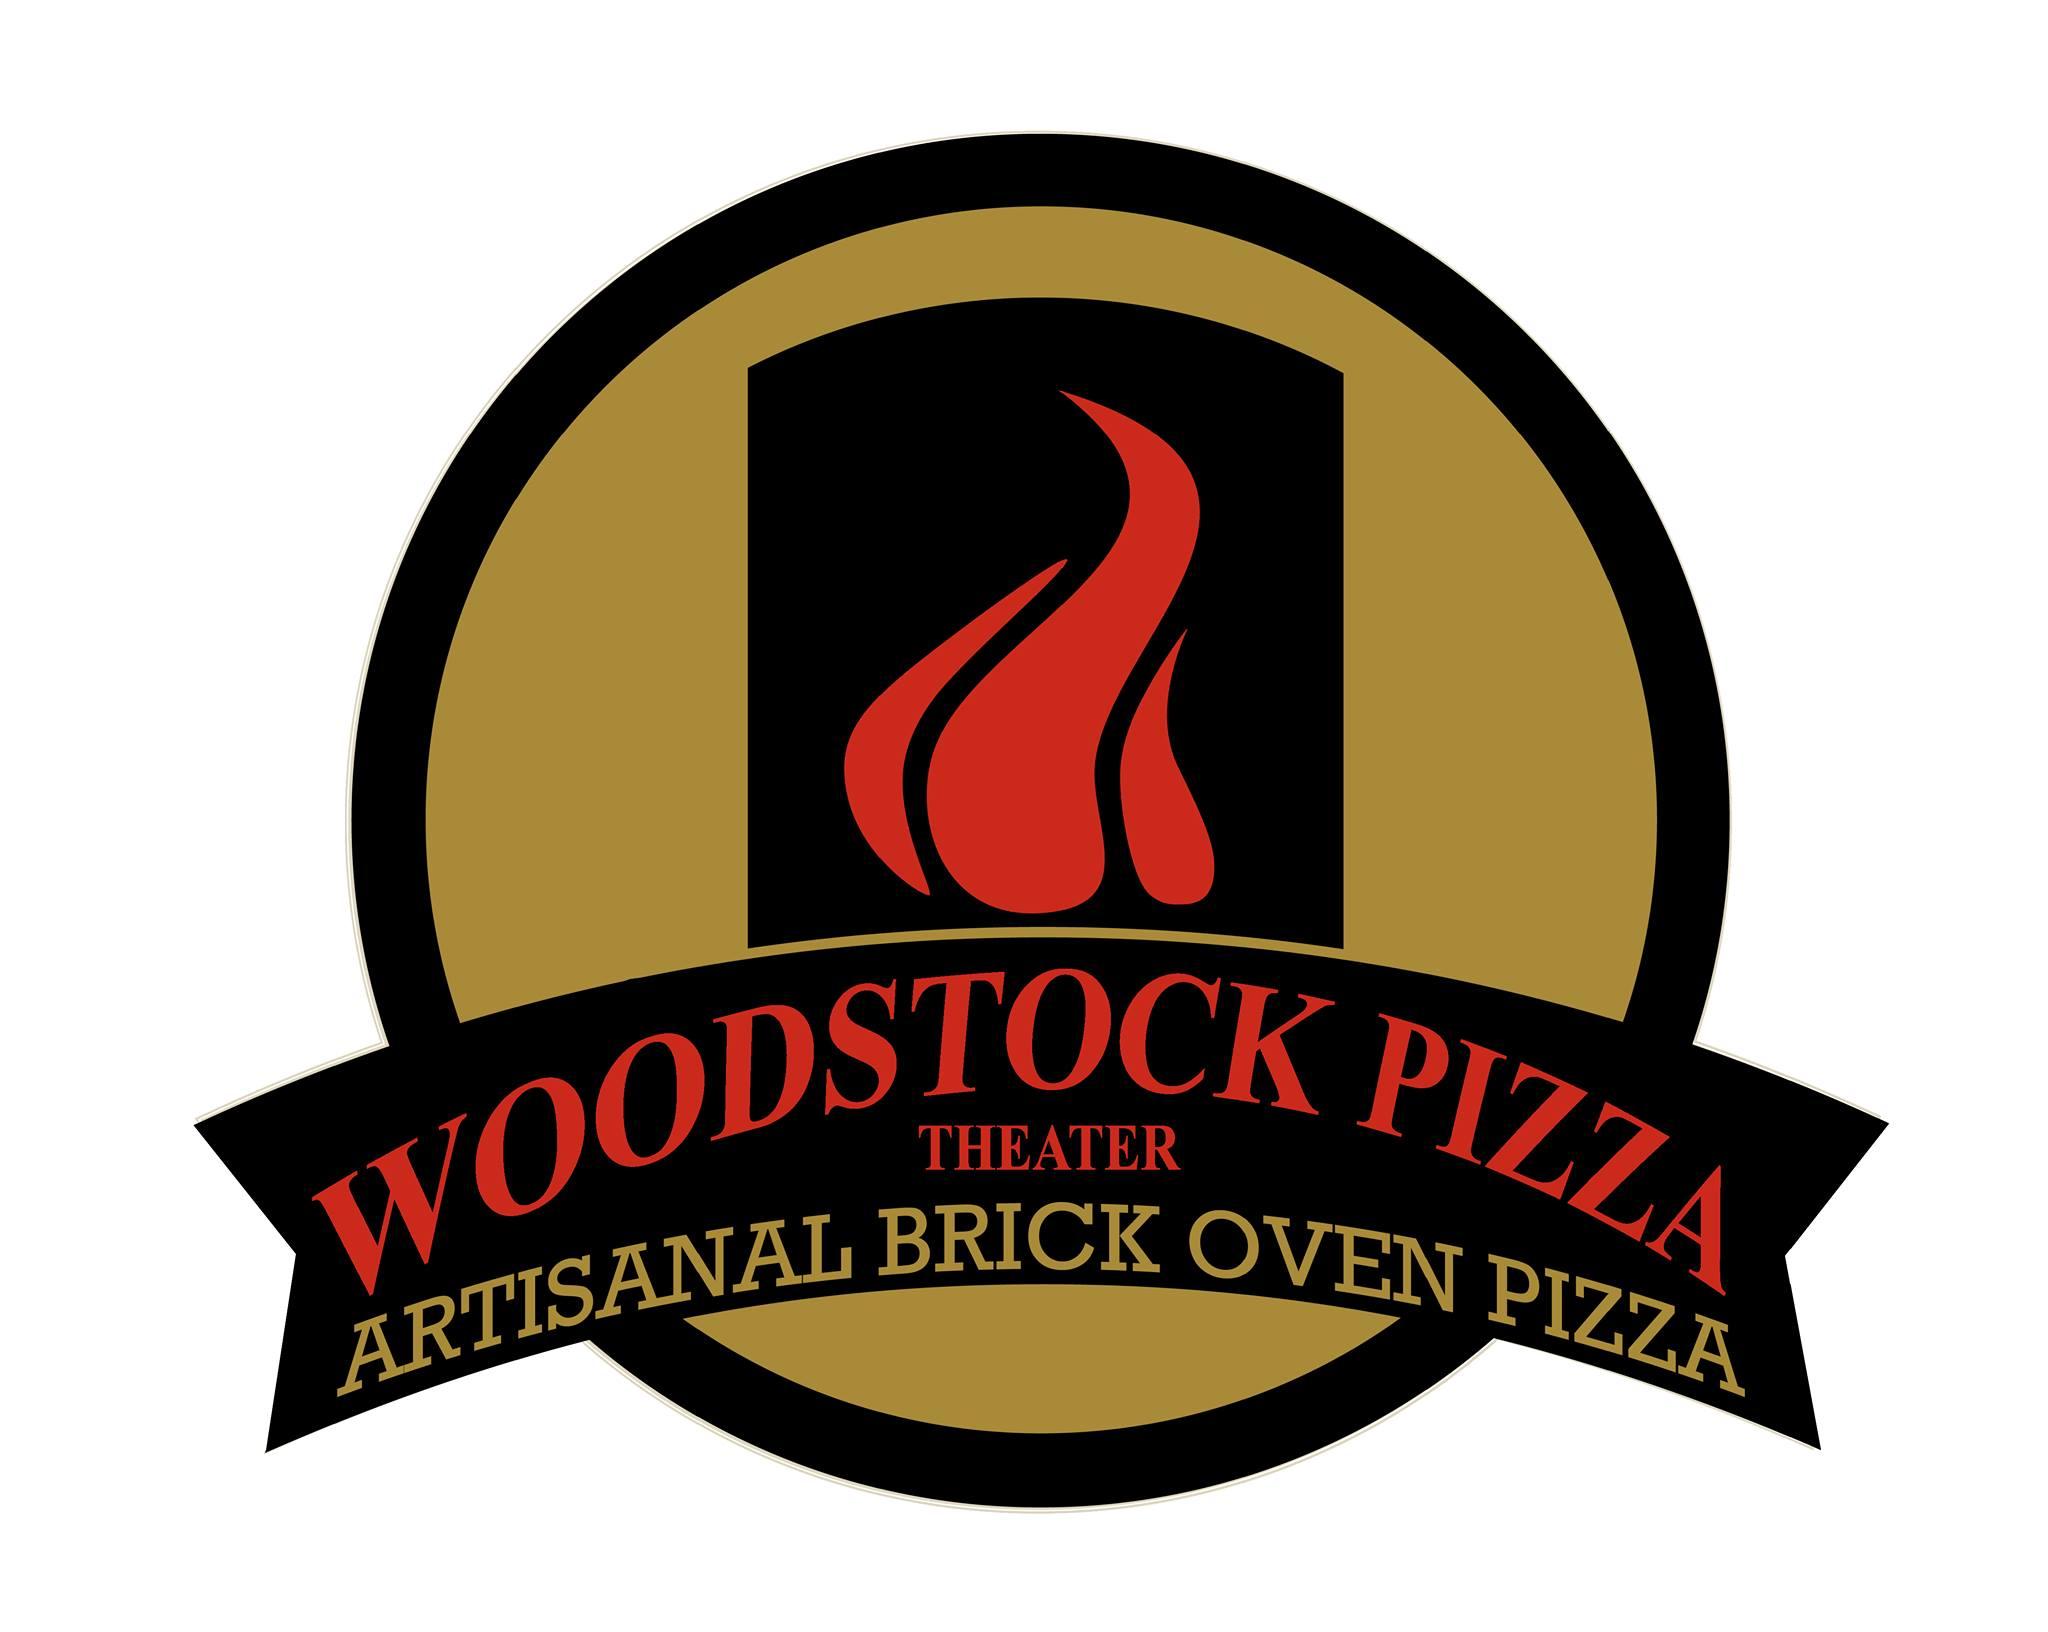 Woodstock Pizza Theater